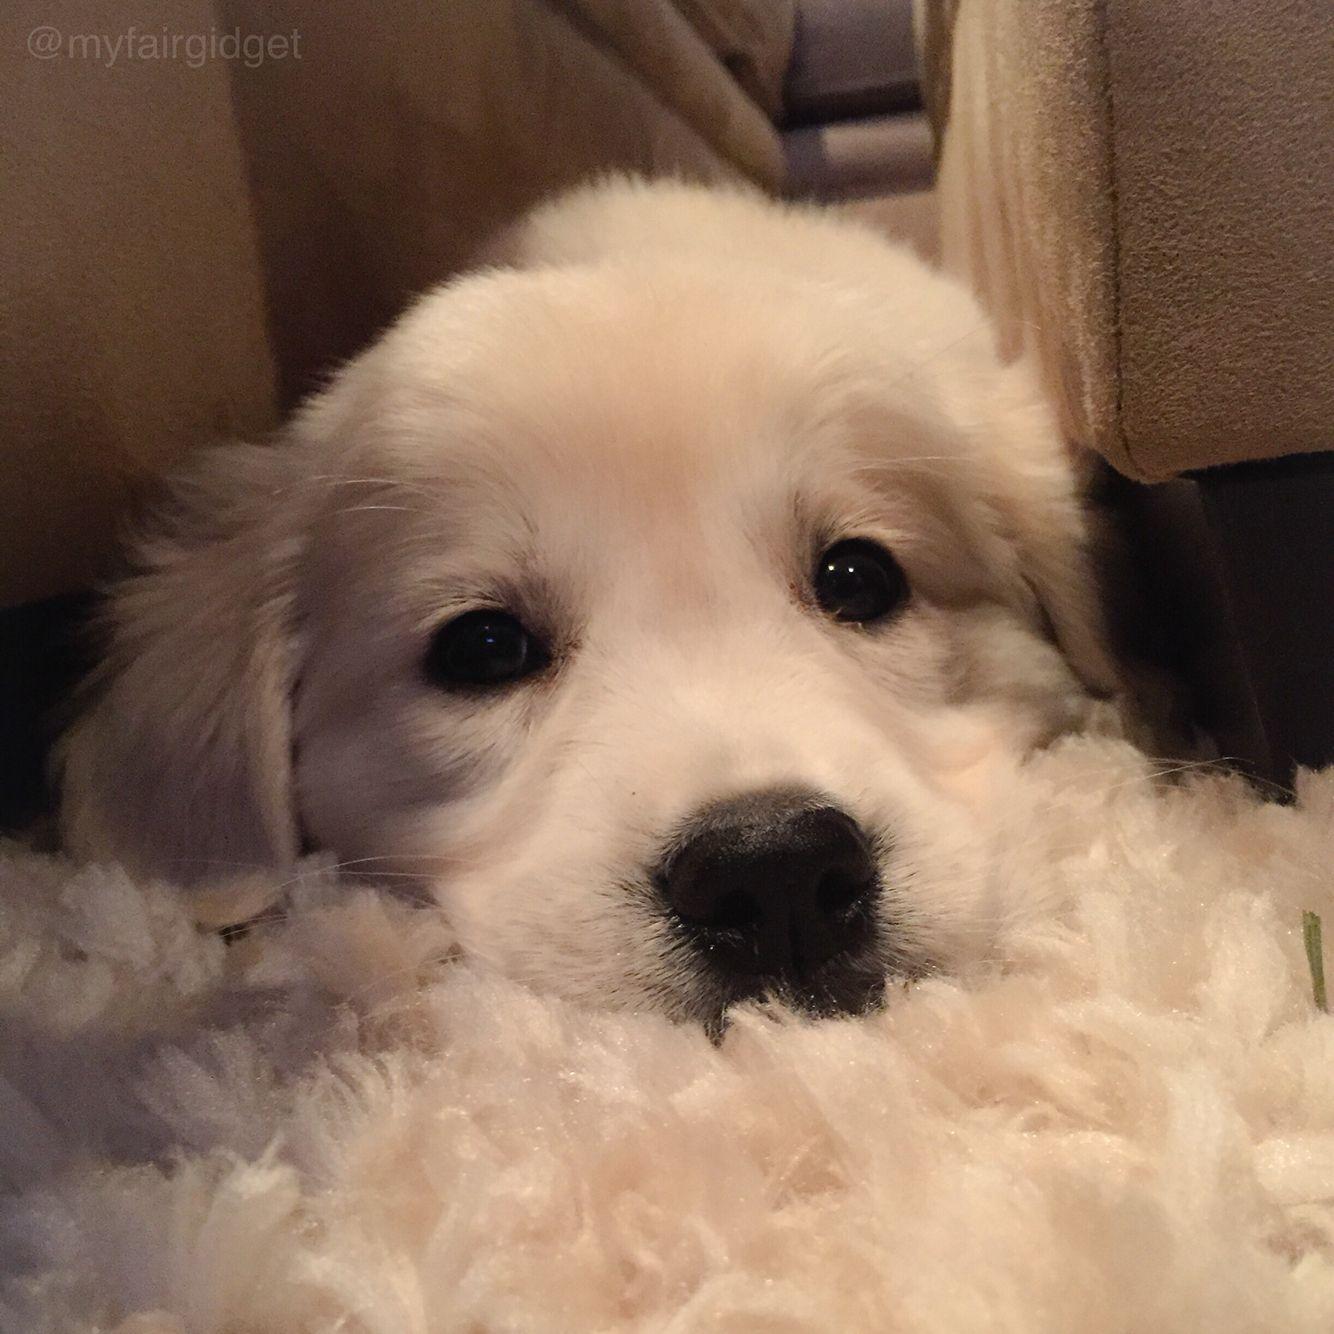 Baby Girl Gidget Lokelani The Little Puppy With Big Ideas An English Cream Golden Retriever Loving Living In Bea Little Puppies Puppies Golden Retriever